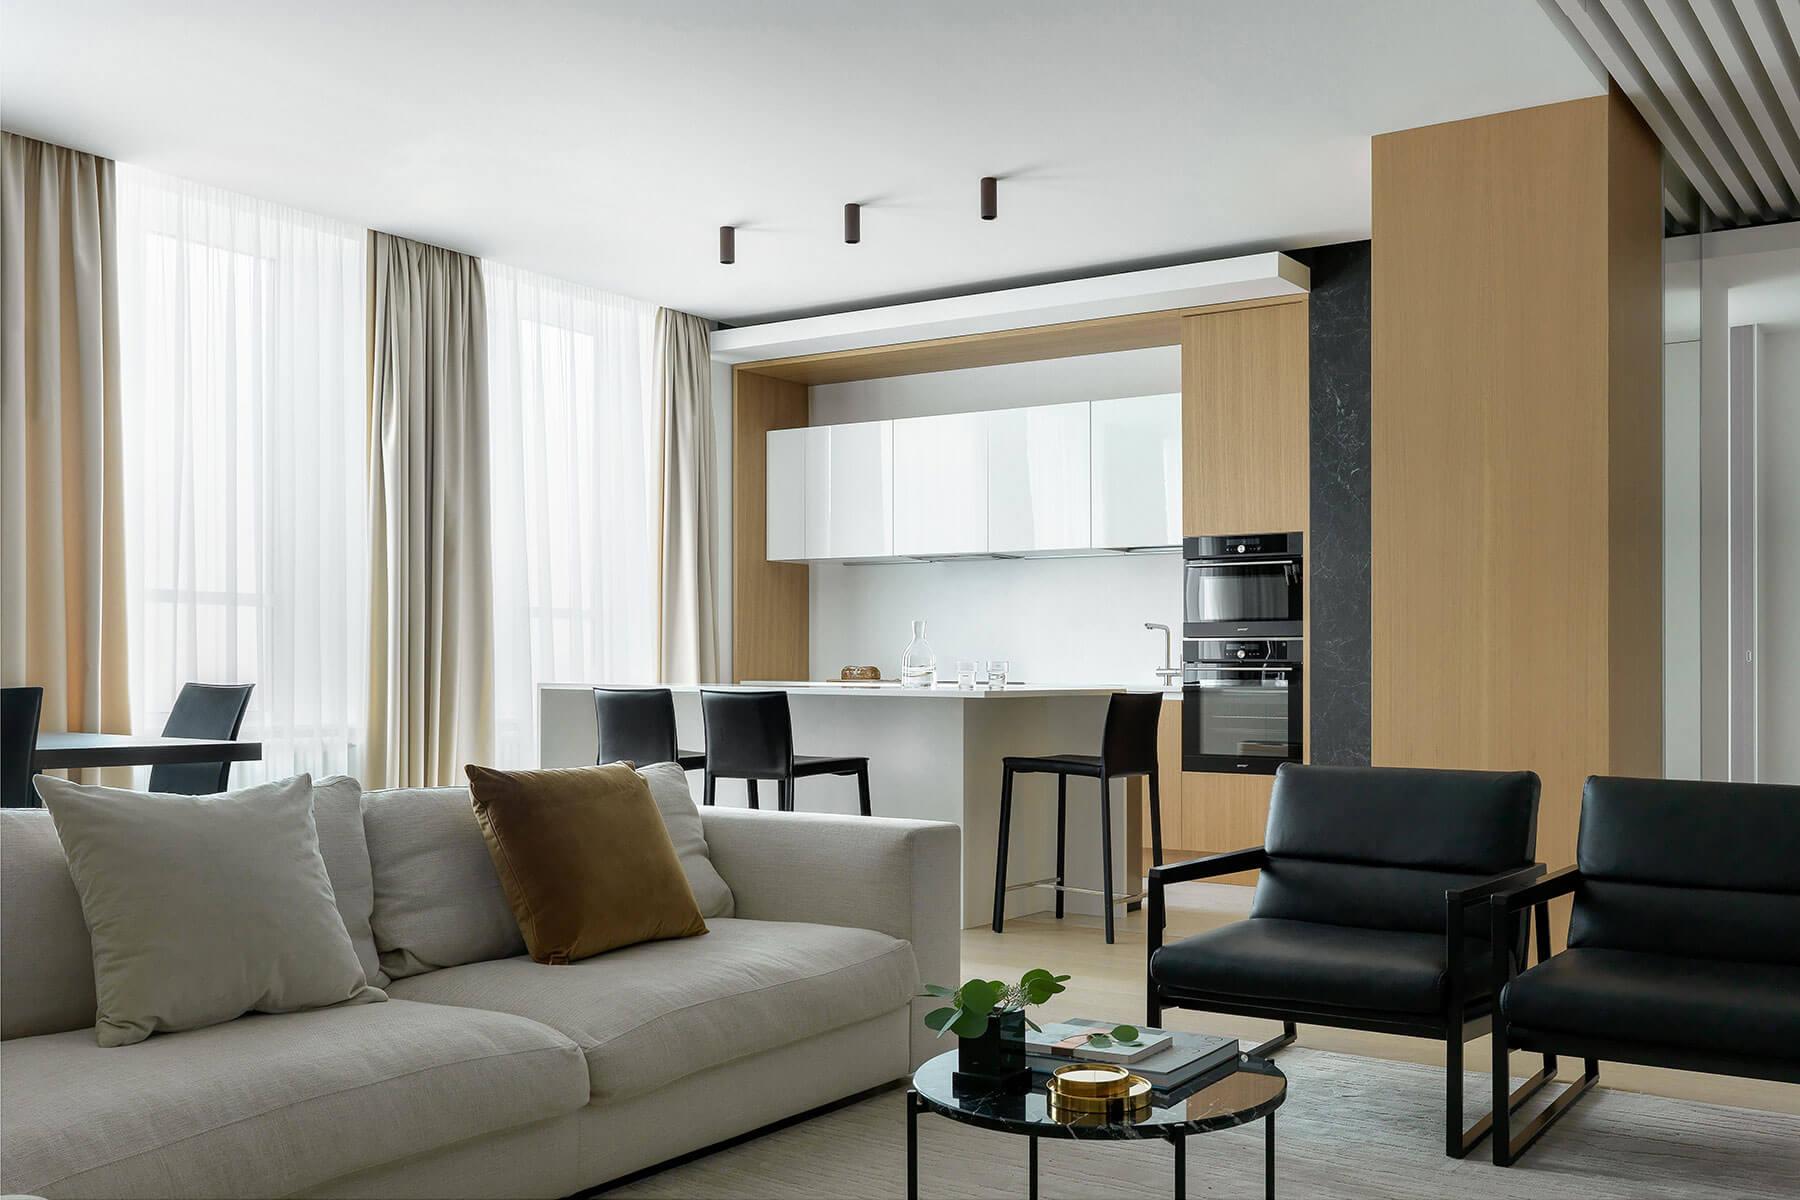 Private Apartment Leninskij, Moscow – RU